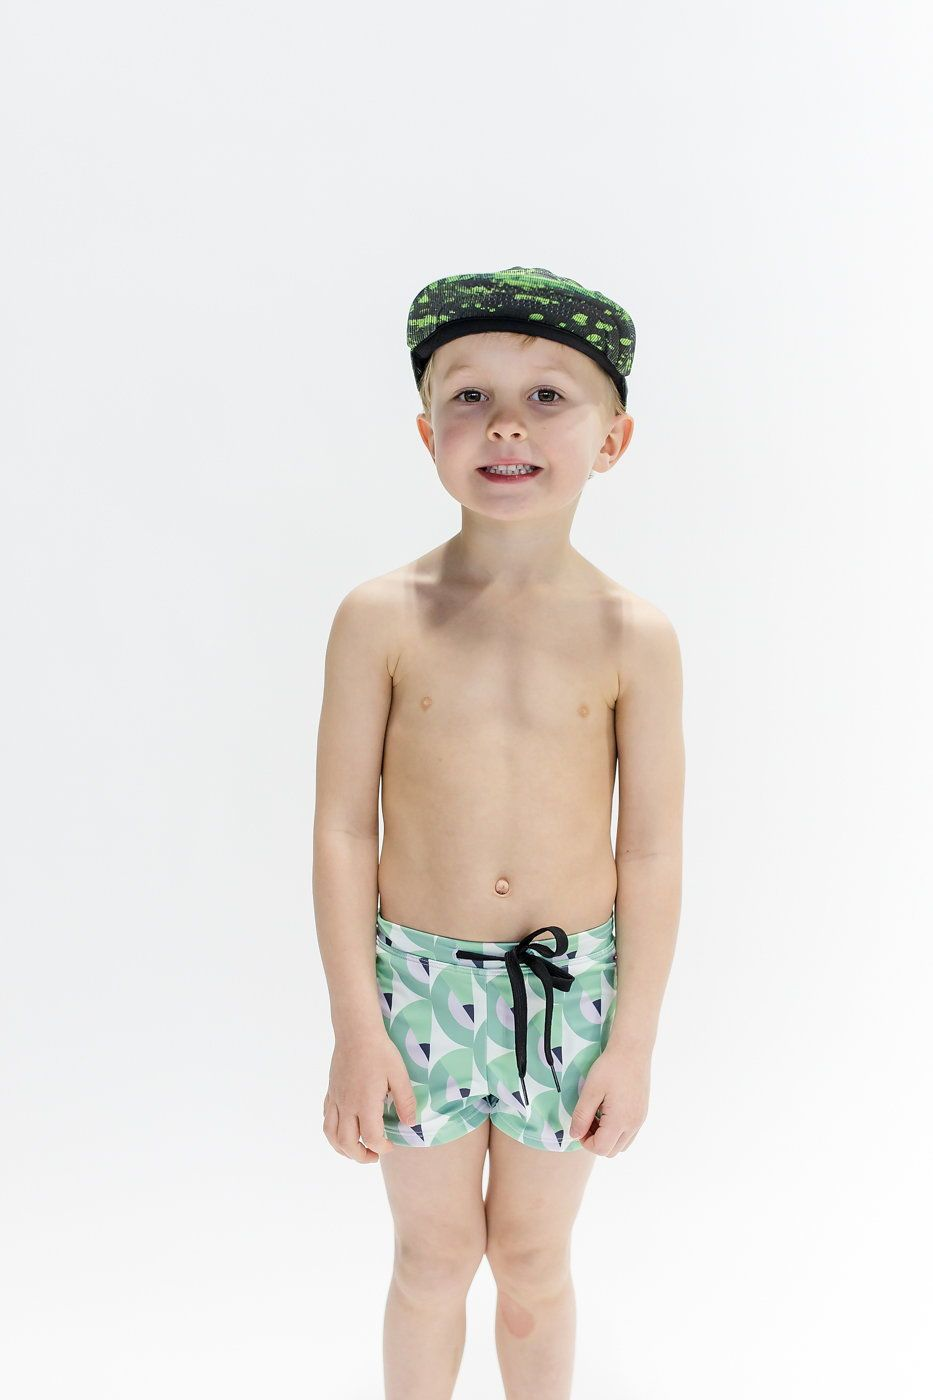 373136421a Kortni Jeane // Kortni Jeane Swimmers // Mini Men Swimmers // Mini Euro  Shorts // Little Boy Swimsuits //